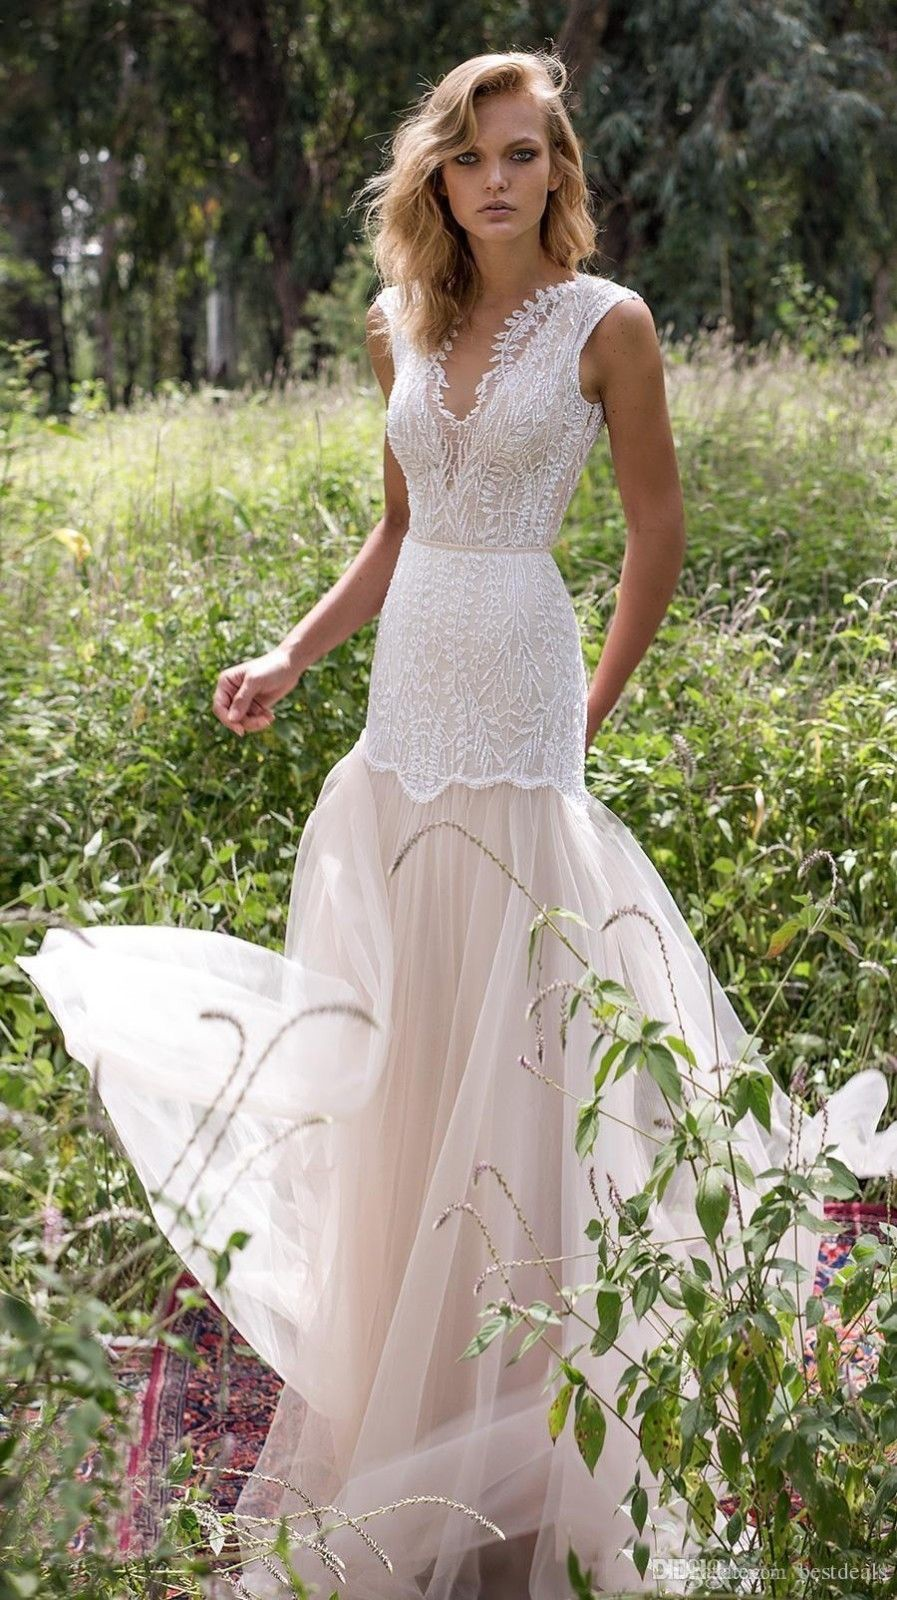 Vintage country wedding dresses illusion bodice applique beach boho